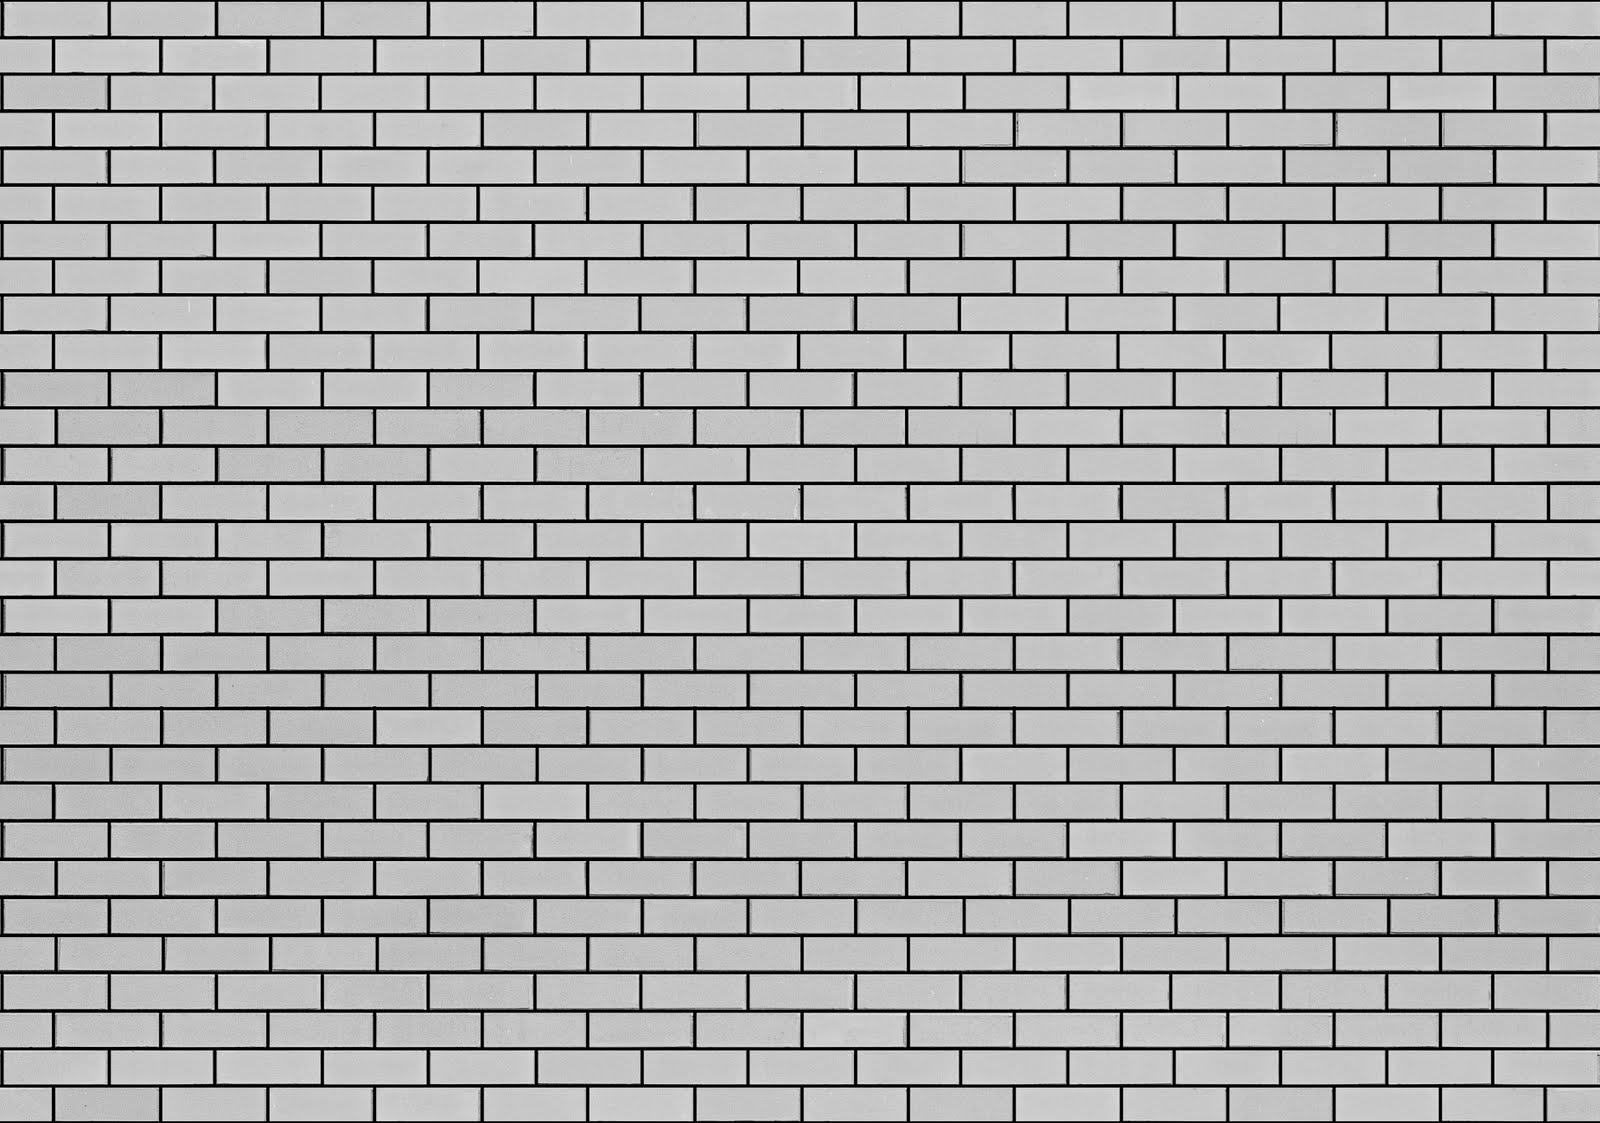 Кирпичная стена текстура рисунок и картинка